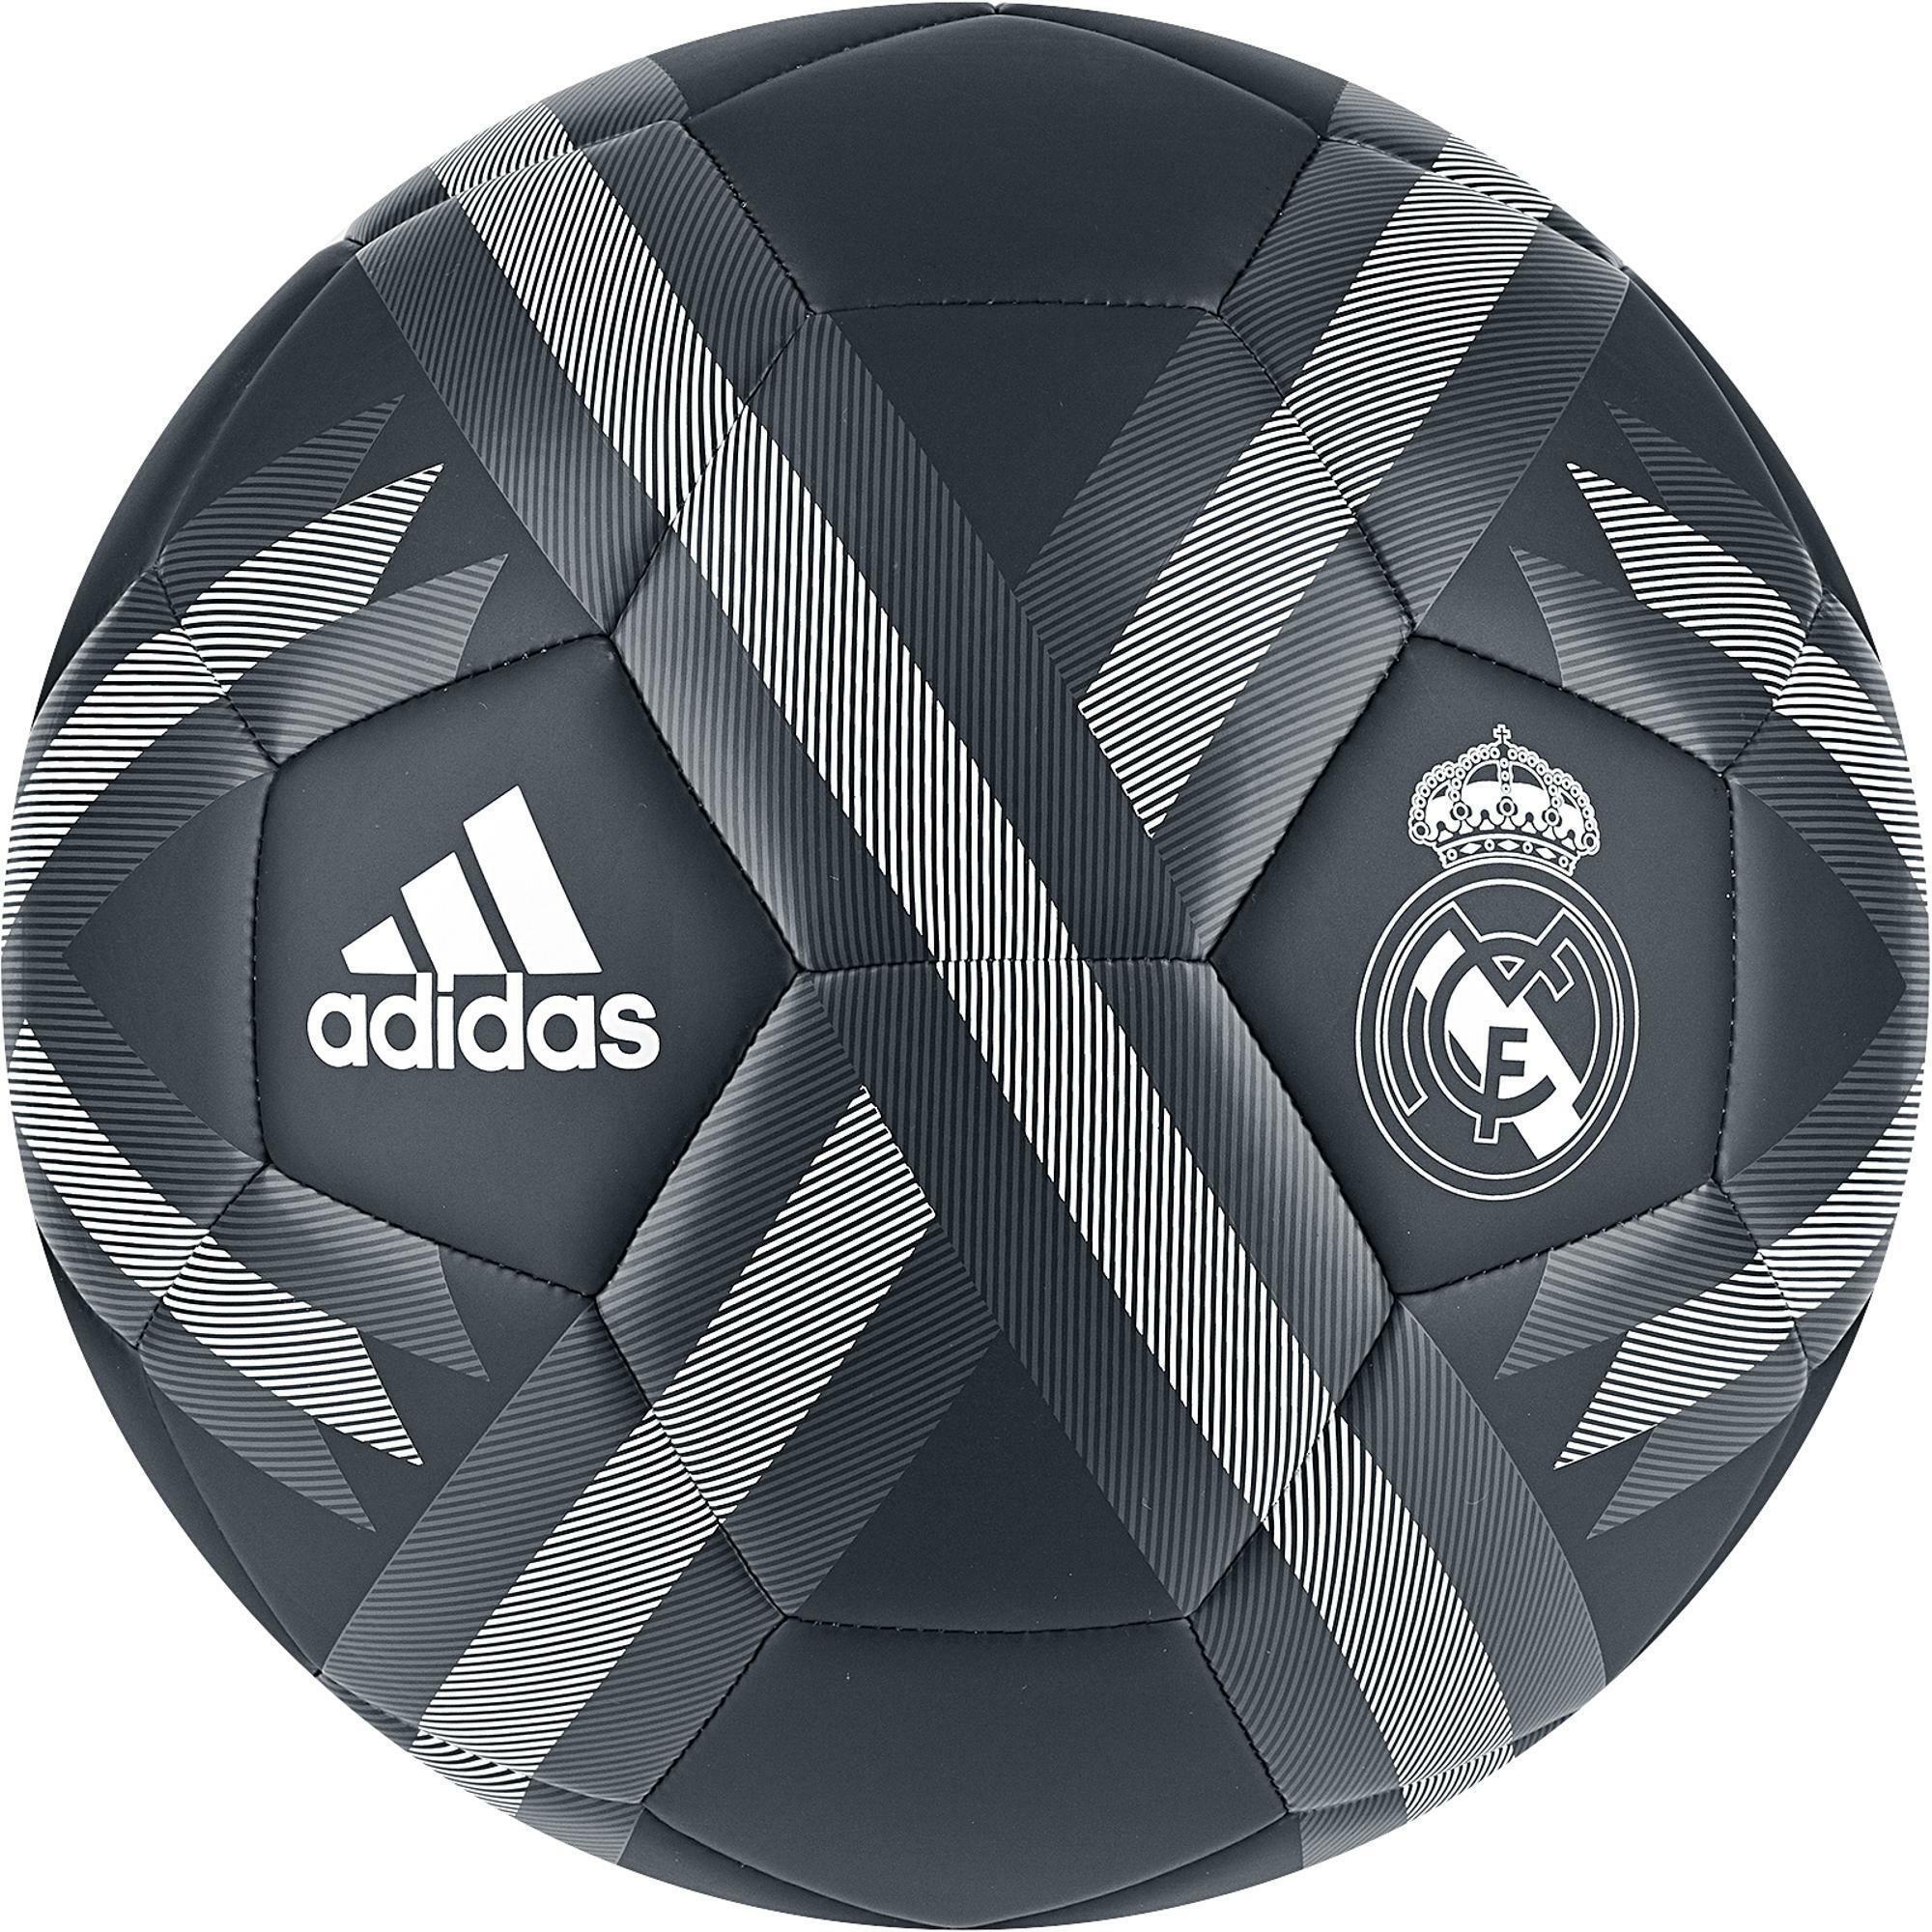 adidas adidas pallone real madrid 19/20